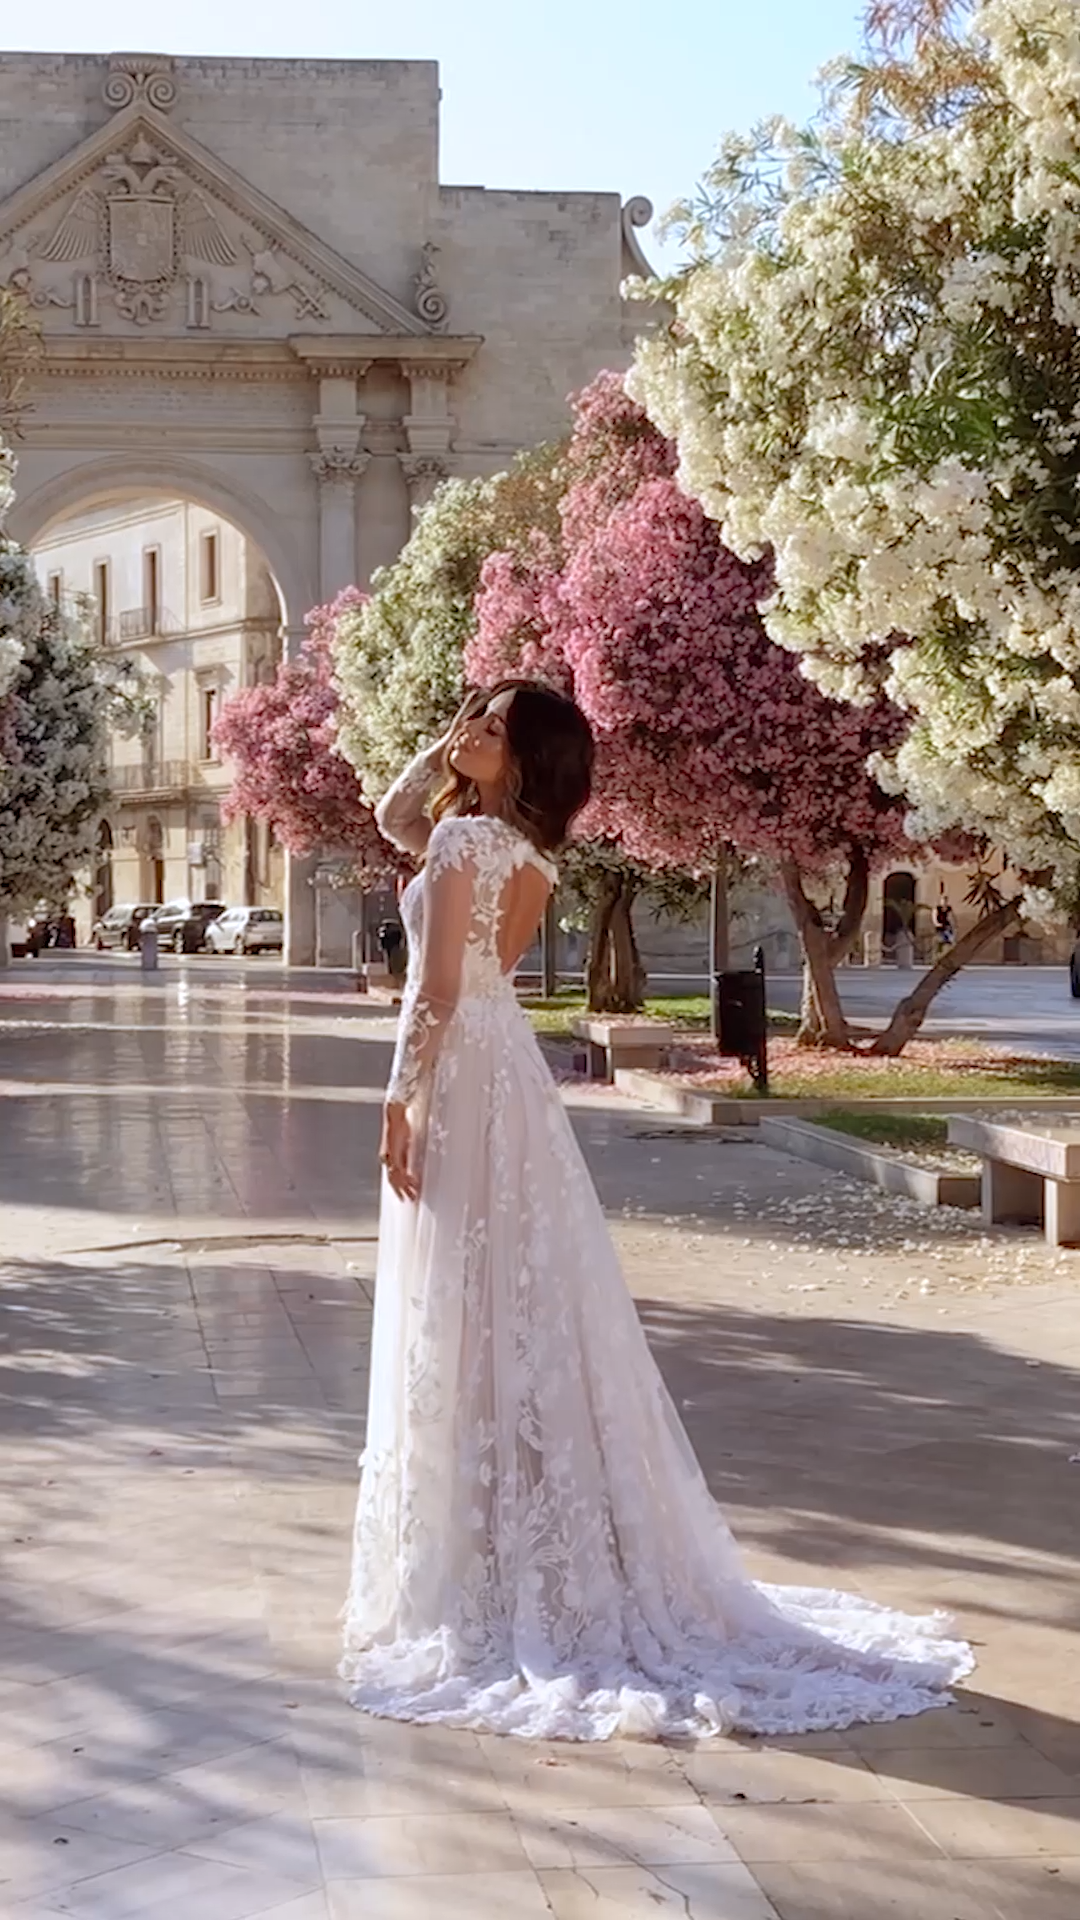 The Meadow Gown By Madi Lane Bridal Bridal Bryllupskjole Gown Simple Elegant Wedding Dress Wedding Dresses Elegant Wedding Dress [ 1920 x 1080 Pixel ]